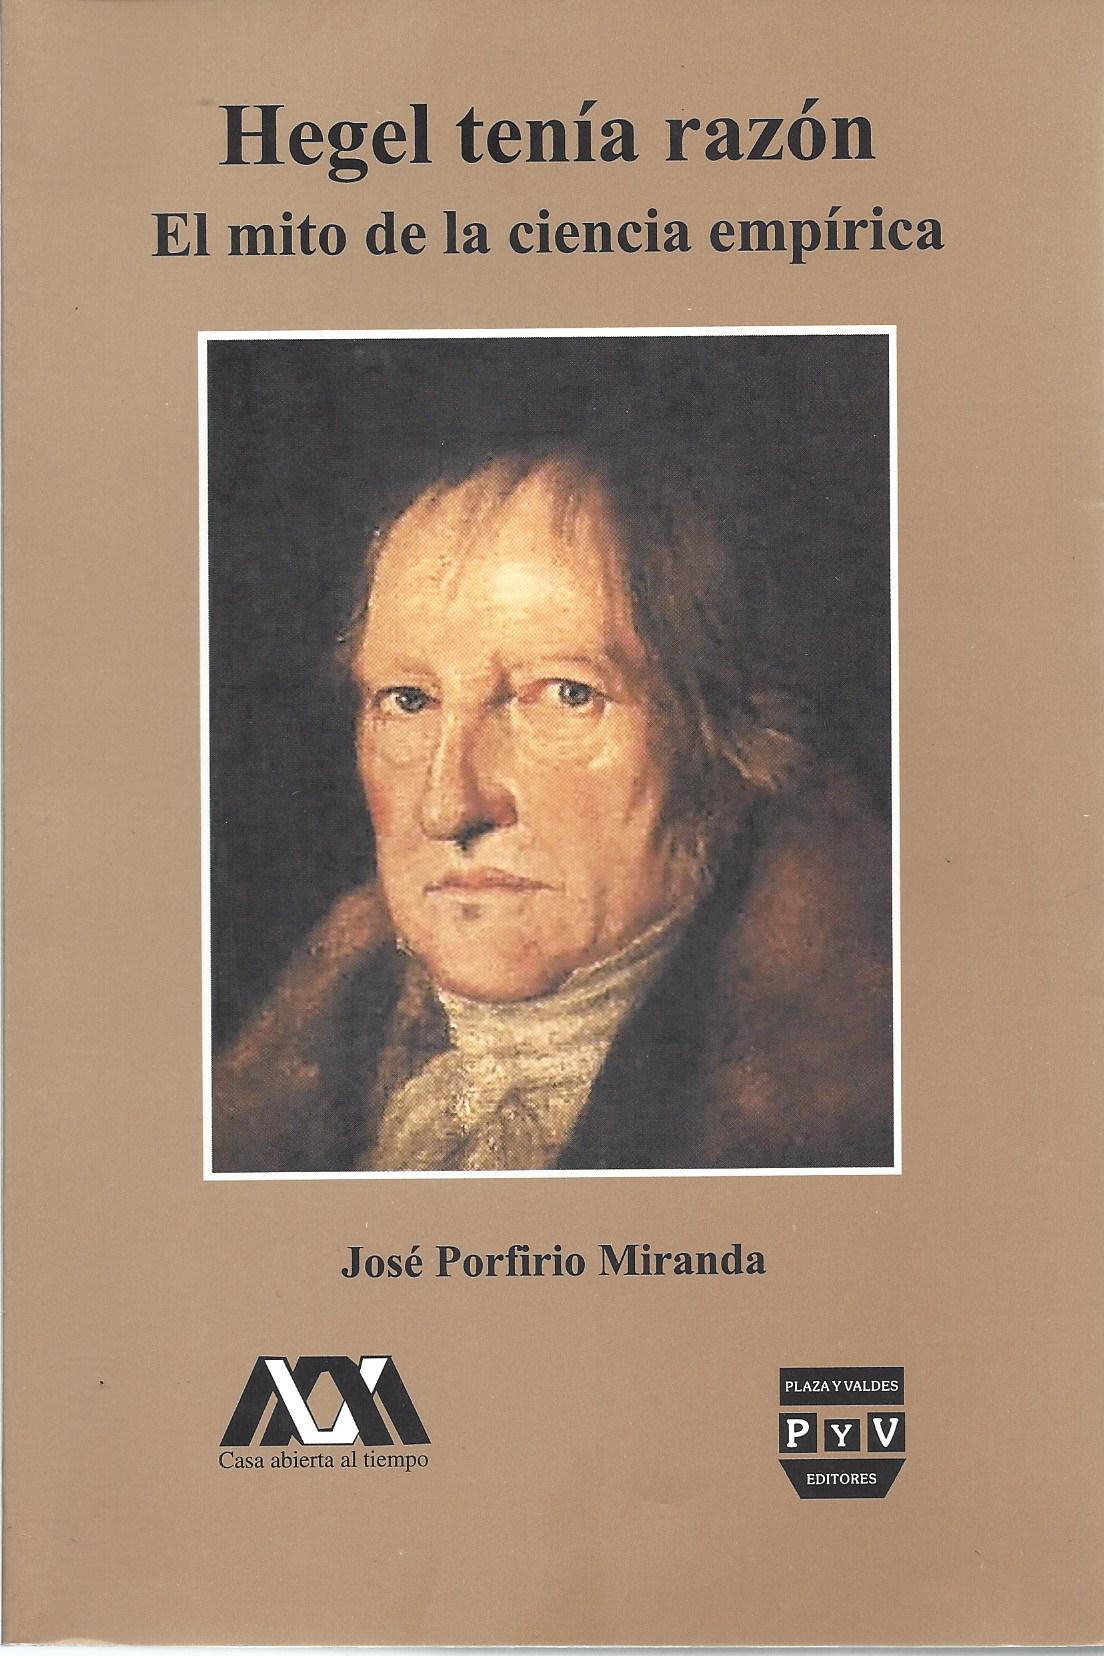 Hegel tenia Raz¢n UAM Plaza y valdez 2002